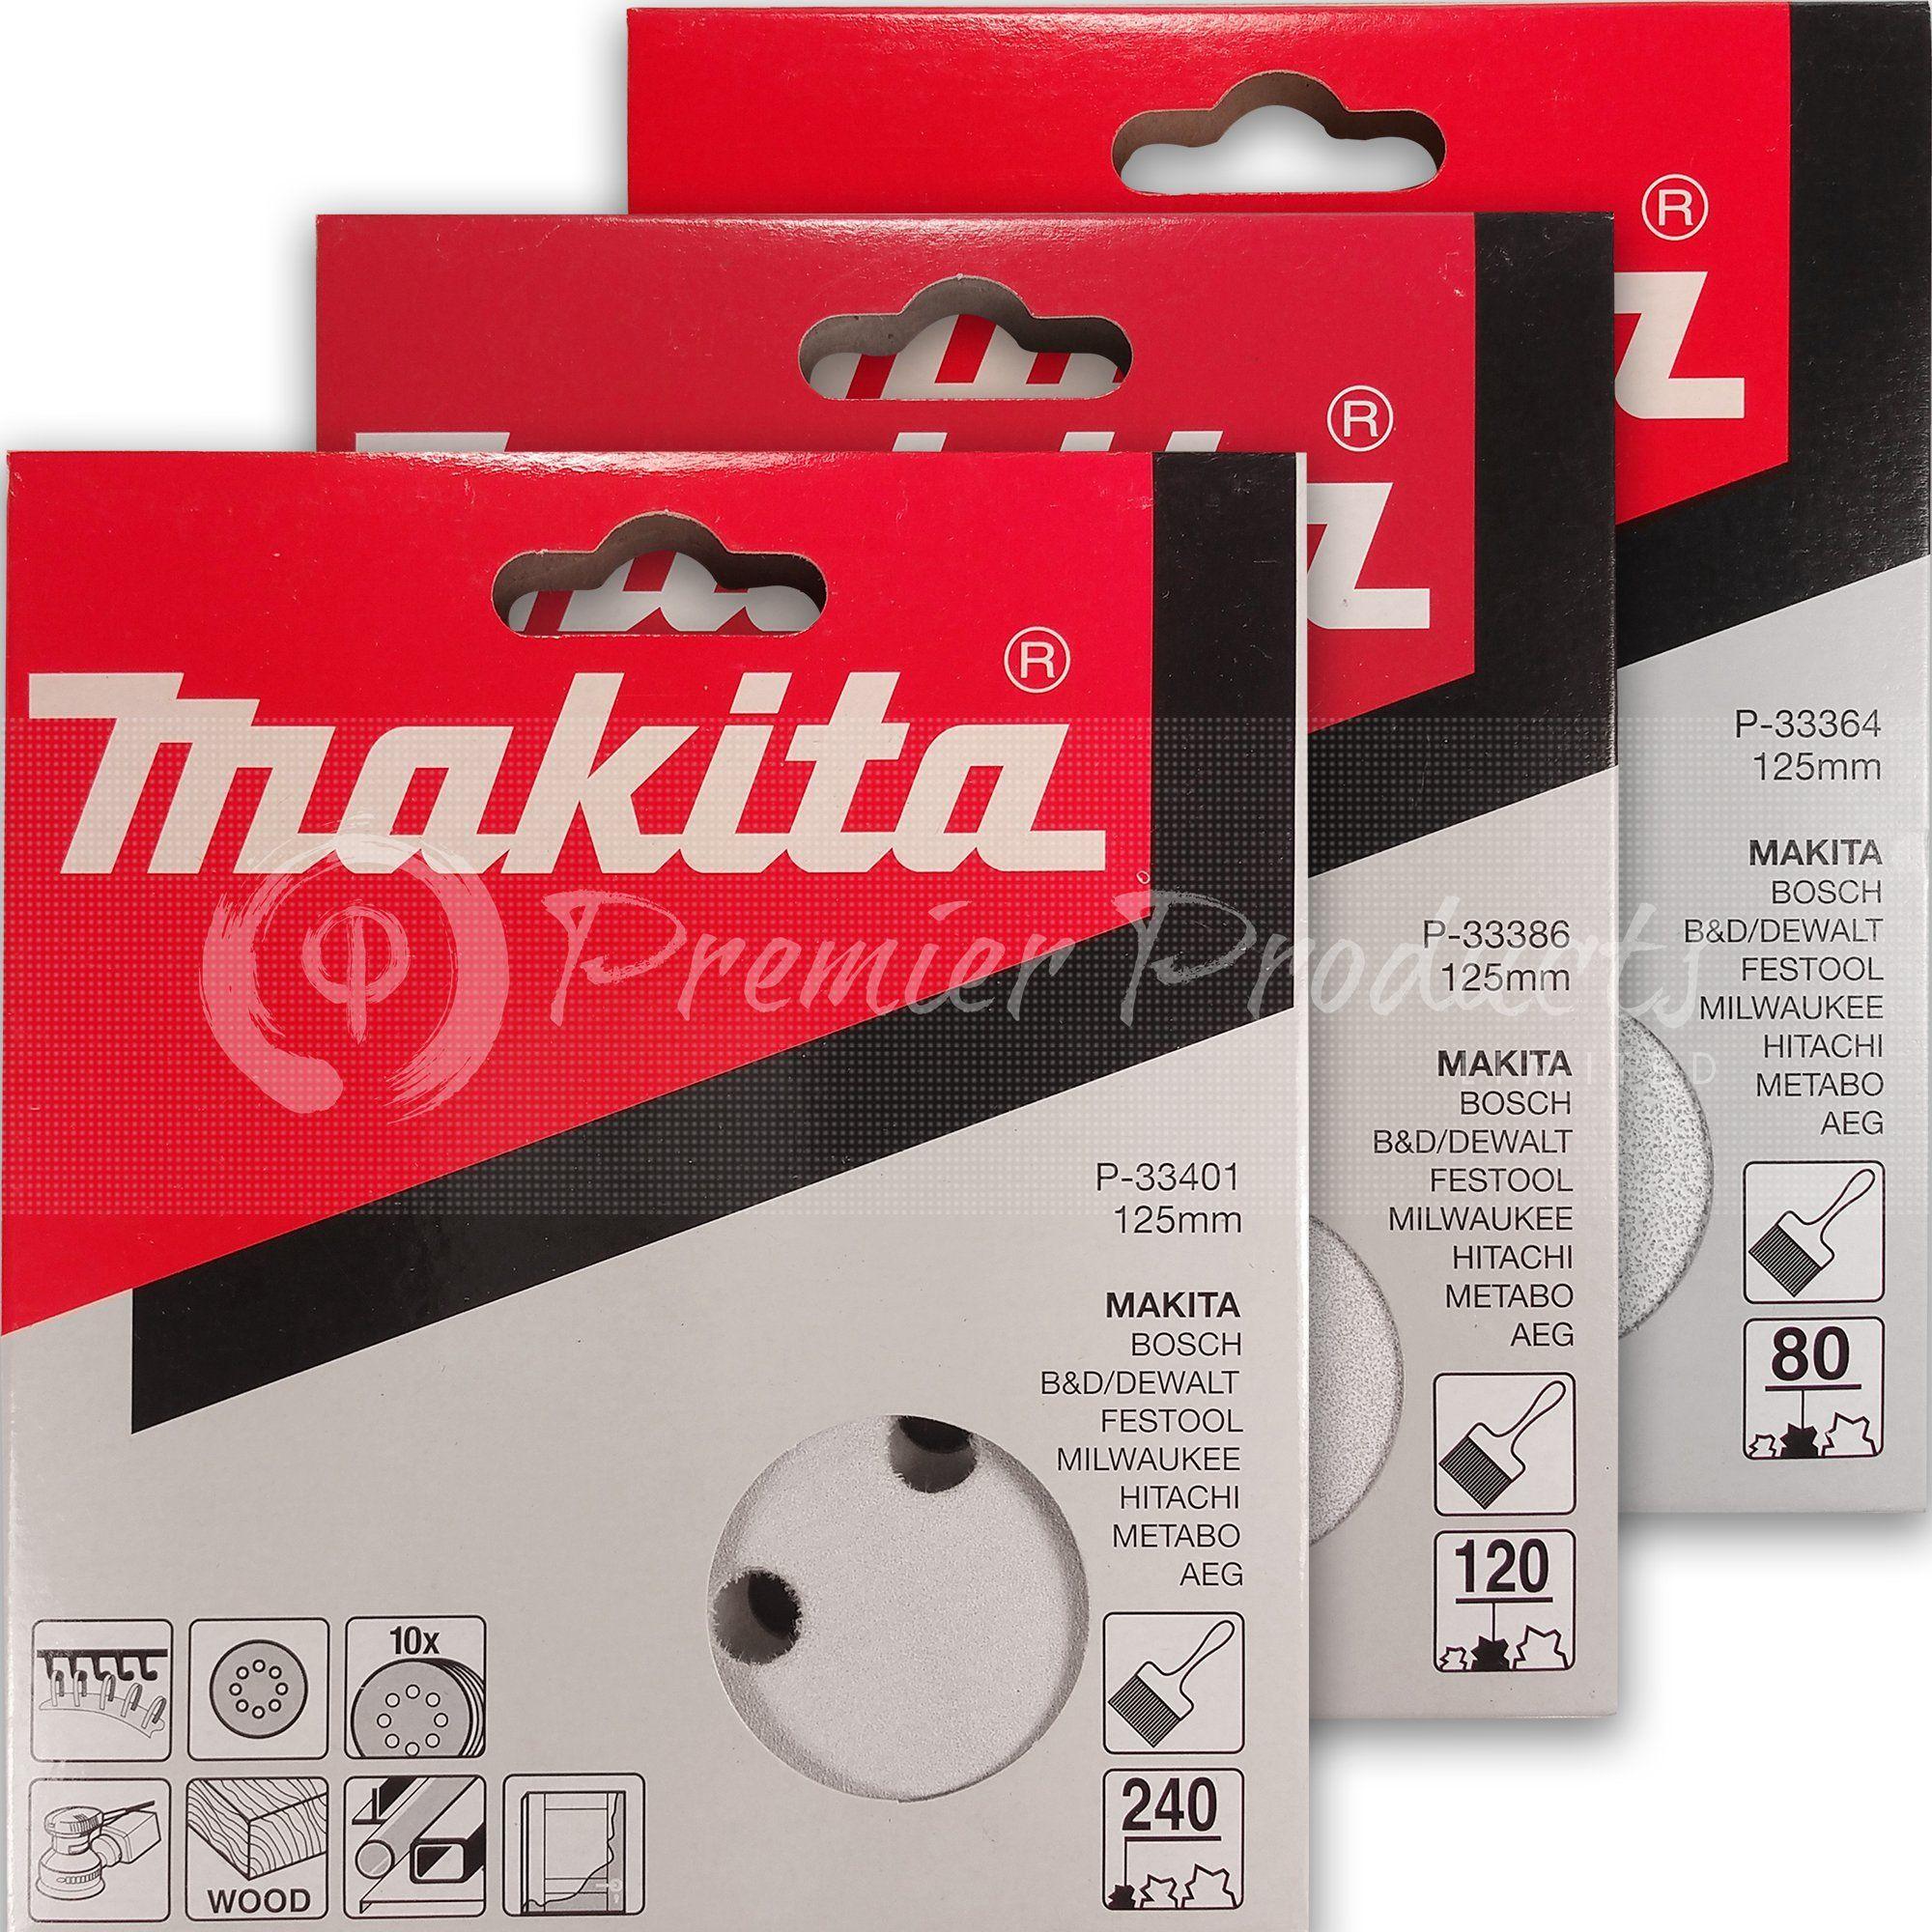 Makita 30 Piece Multi Grit Sanding Disc Set For 5 Inch Random Orbit Sanders For Wood Metal Makita Sanding Sandpaper